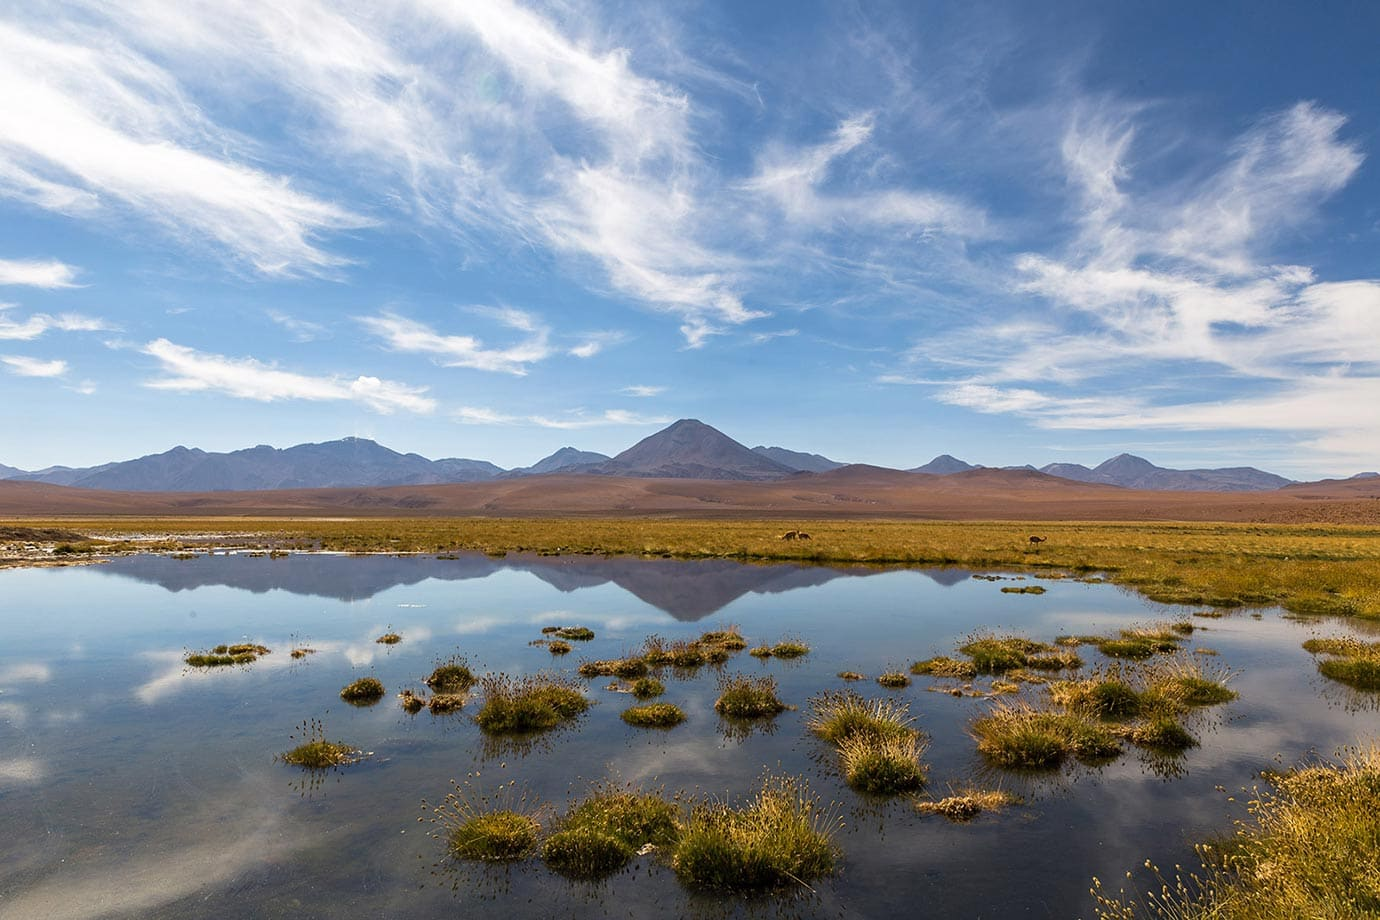 Lakes and mountains in the Atacama Desert